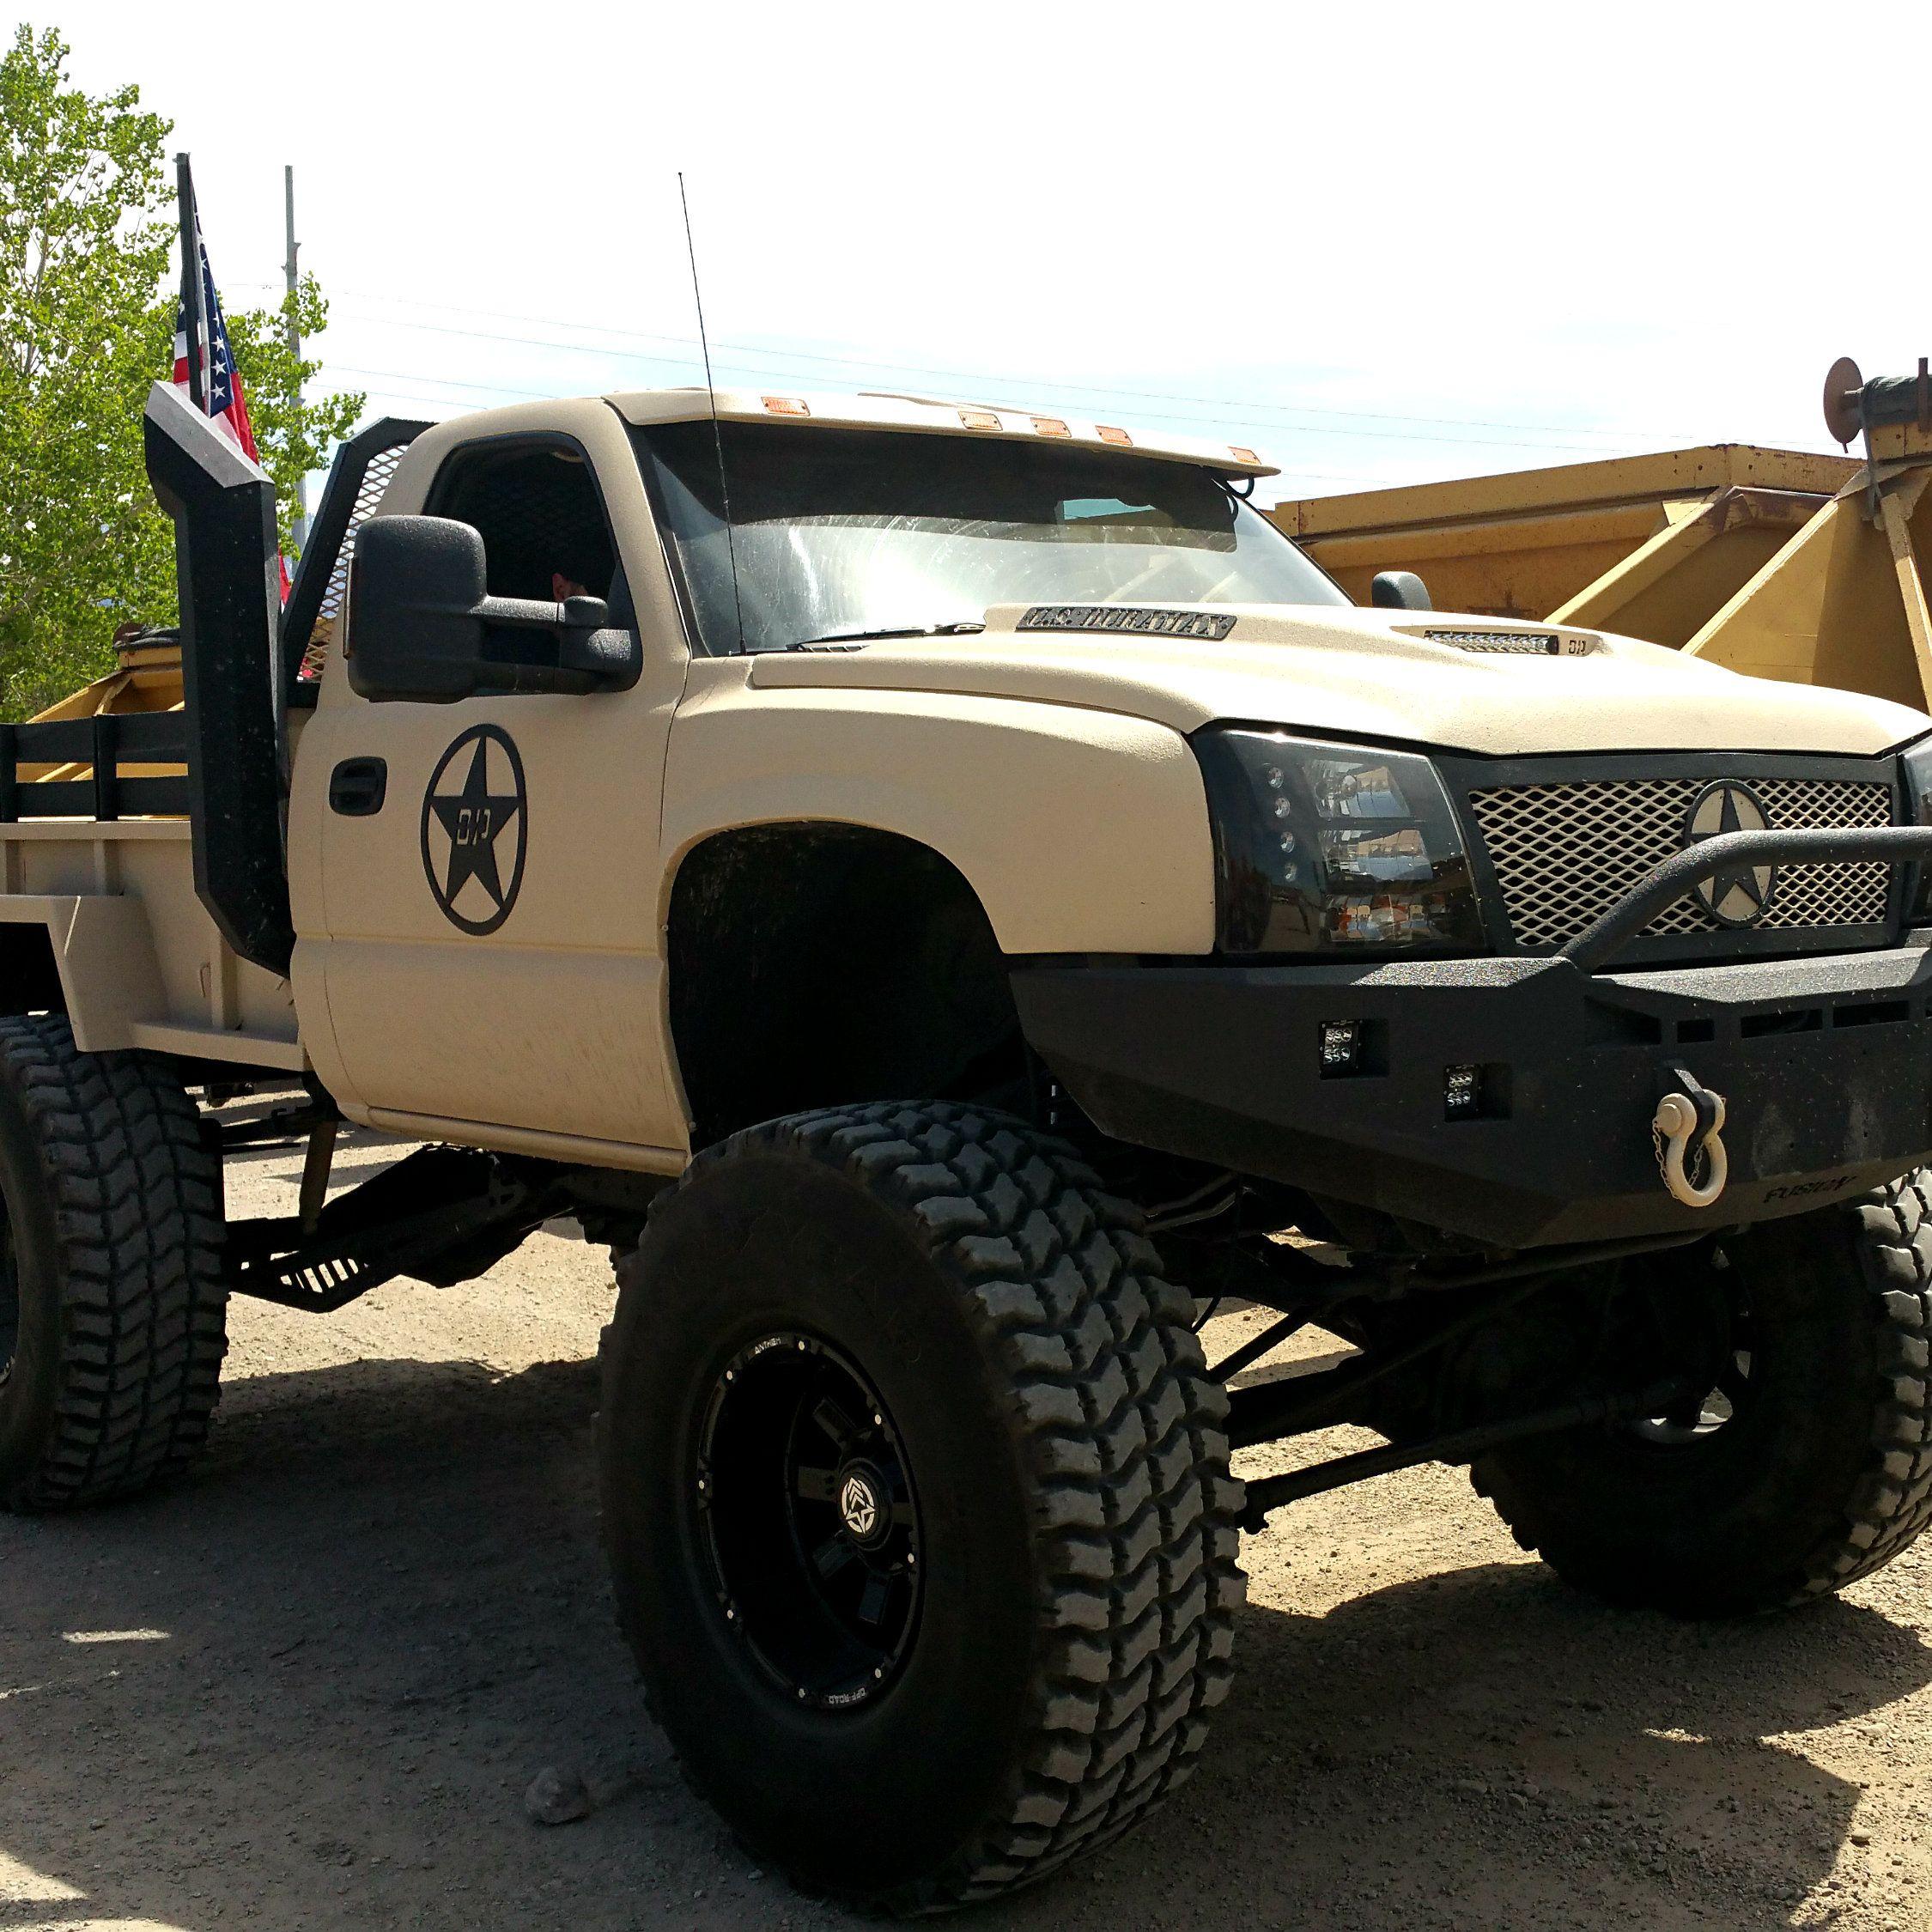 Duramax diesel single cab tan military tribute solid front axle diesel sellerz